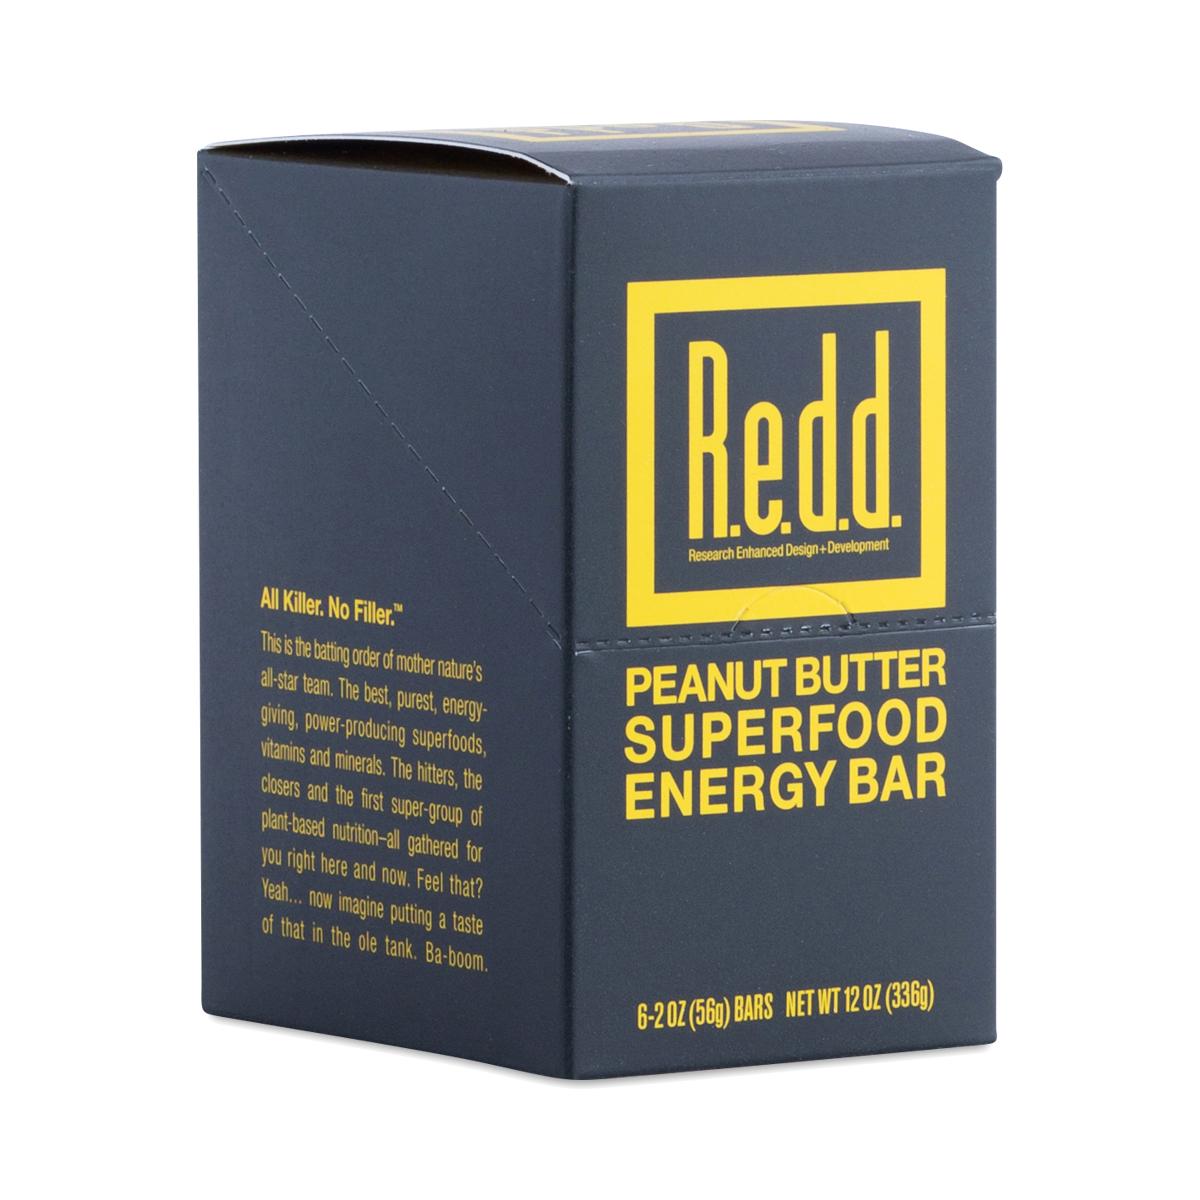 Redd Peanut Butter Superfood Energy Bar six 2.2 oz bars